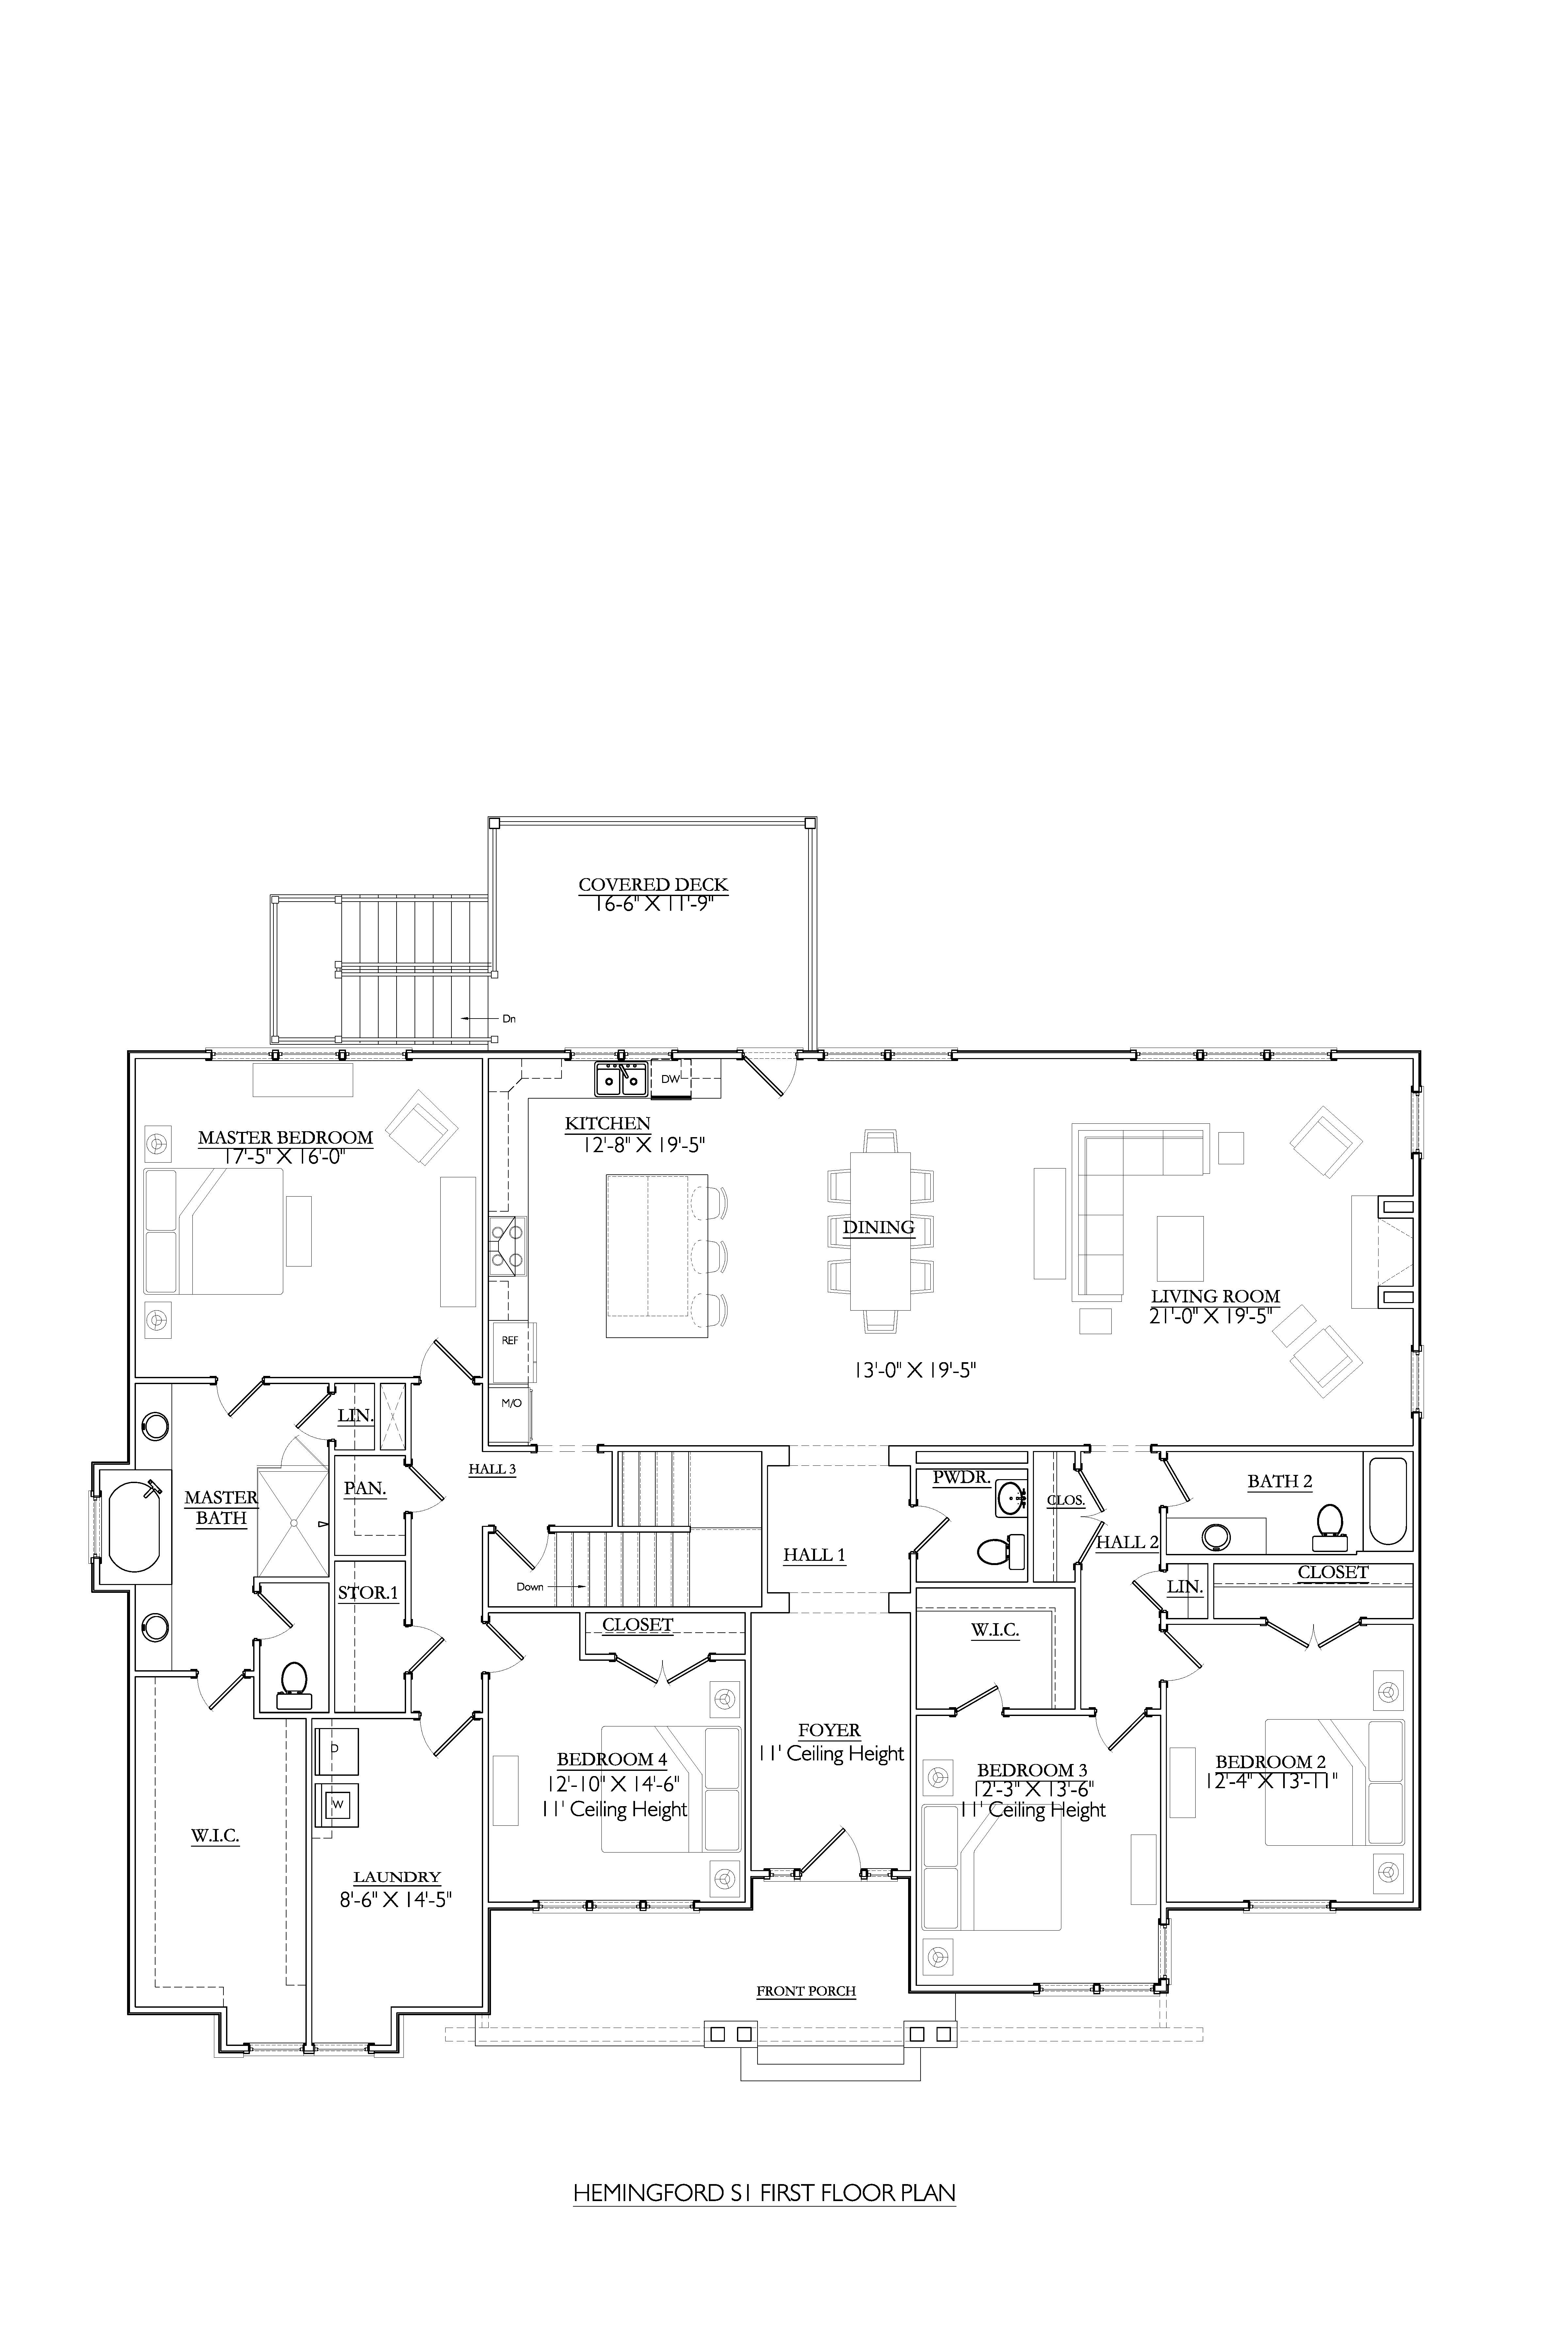 Hemingford S1 Basement- Homesite 29Main Level